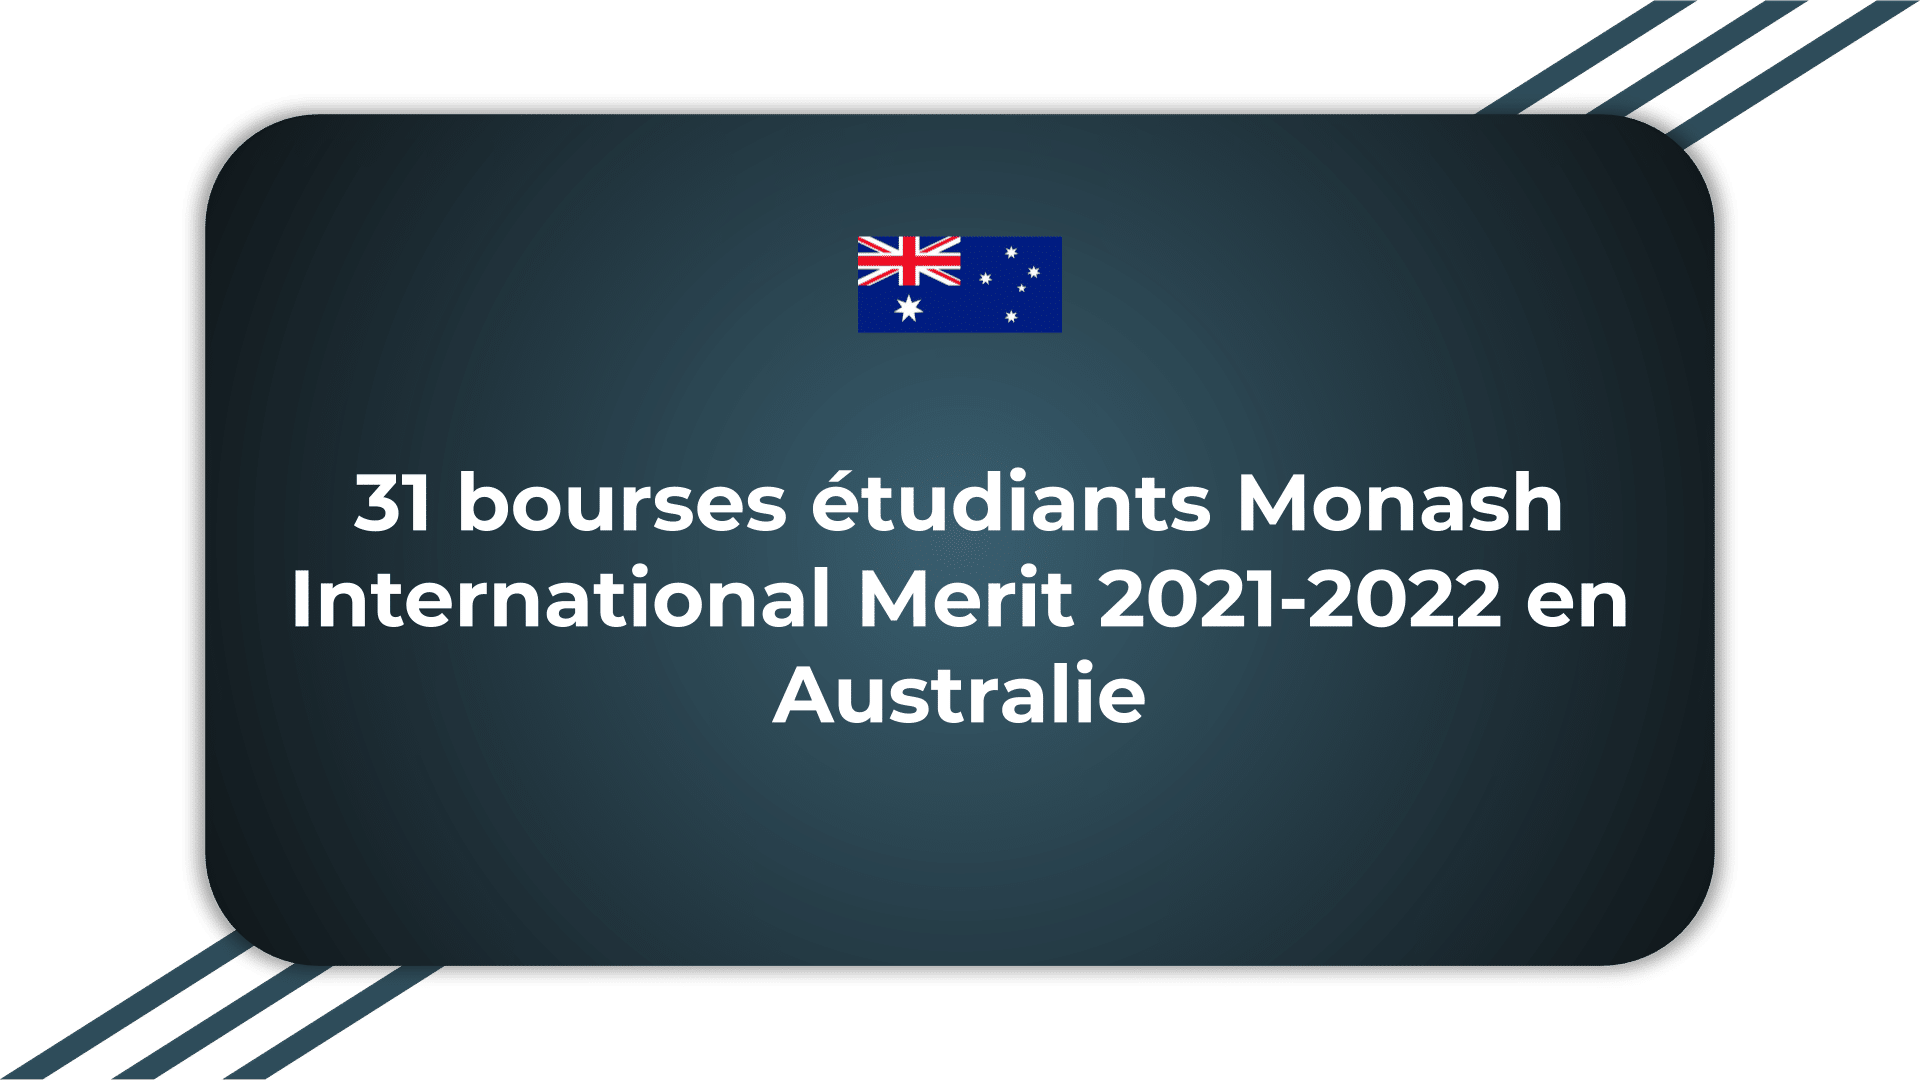 31 bourses étudiants Monash International Merit